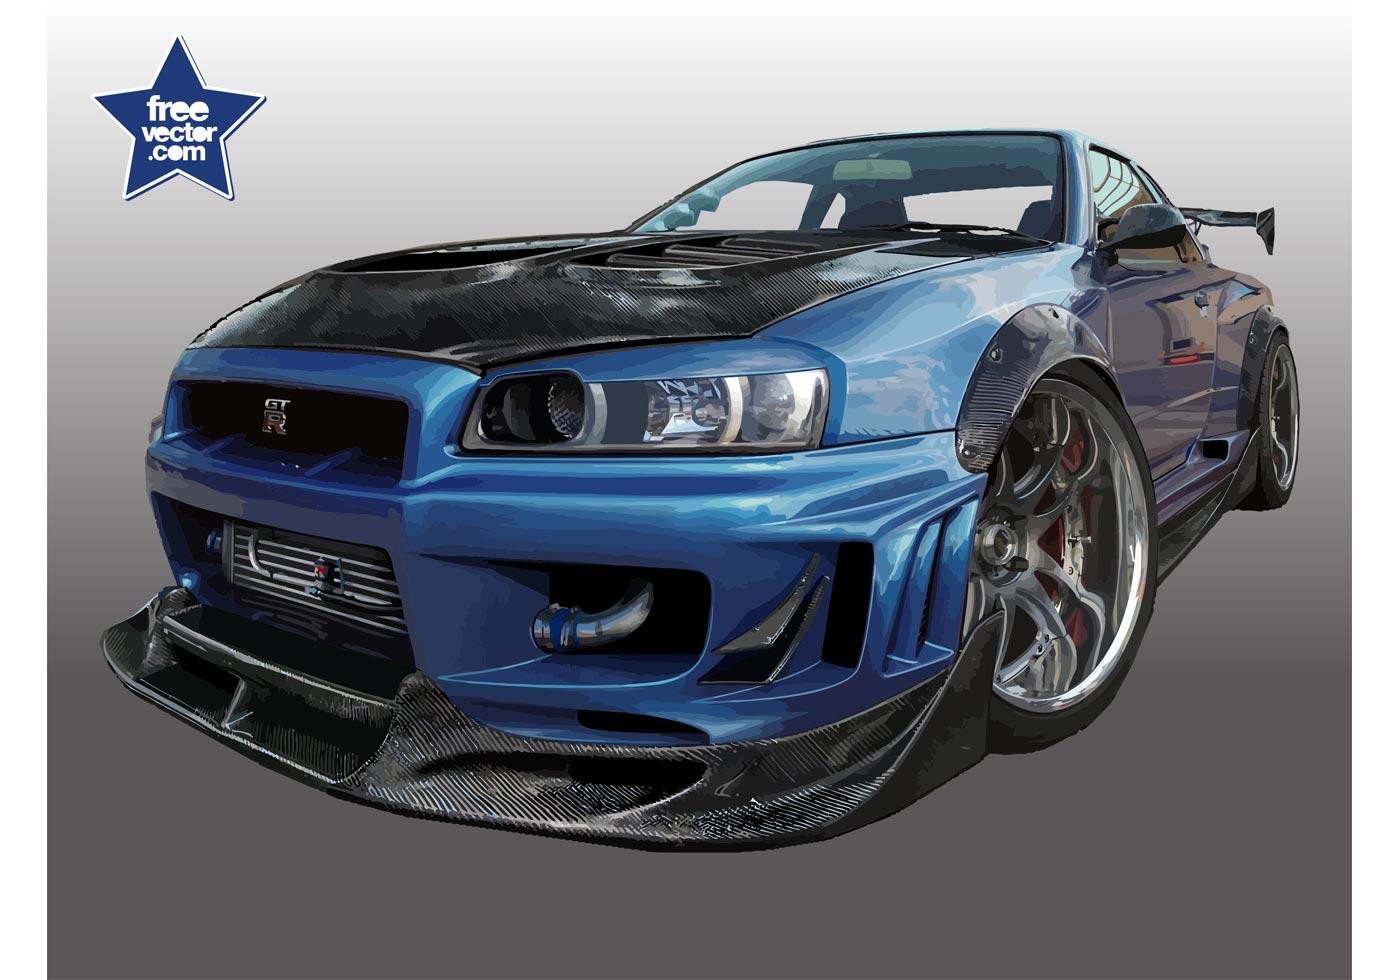 Nissan Gtr Free Vector Art 12 Downloads R35 Sketch